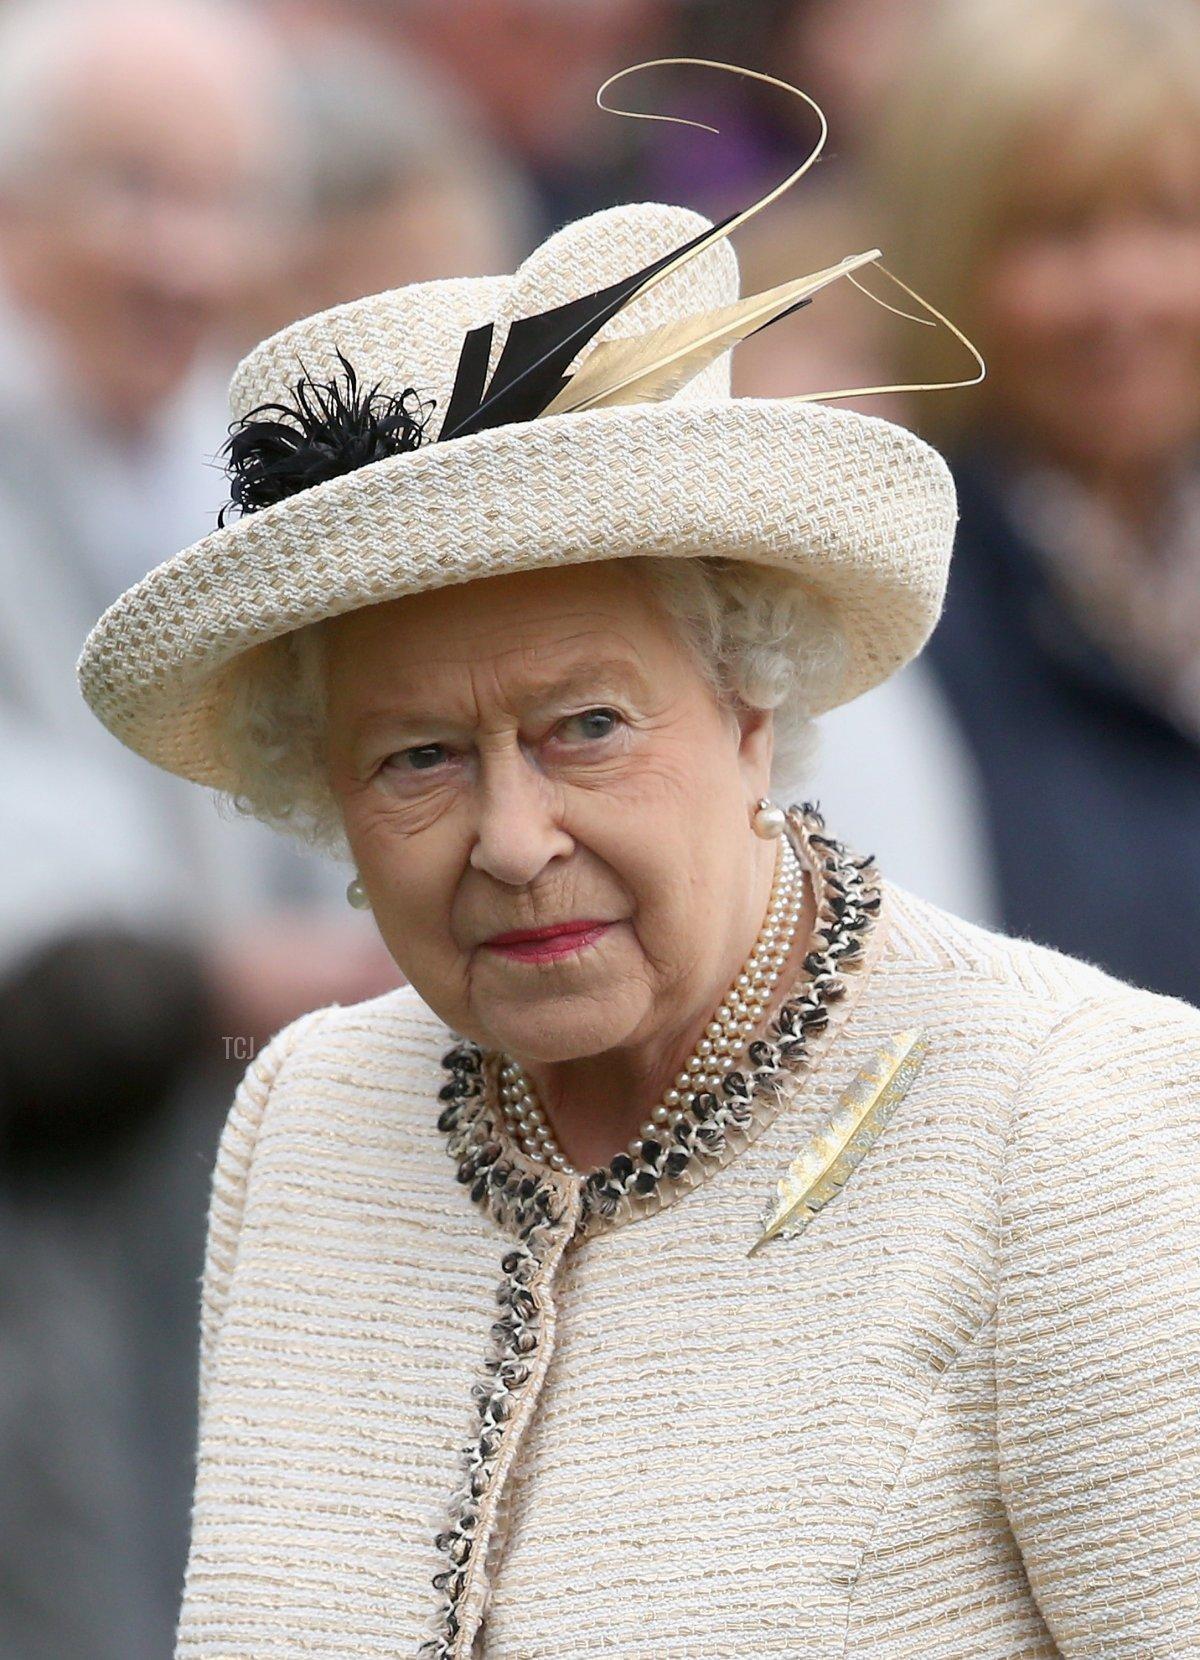 Queen Elizabeth II during the Braemar Highland Games on September 6, 2014 in Braemar, Scotland